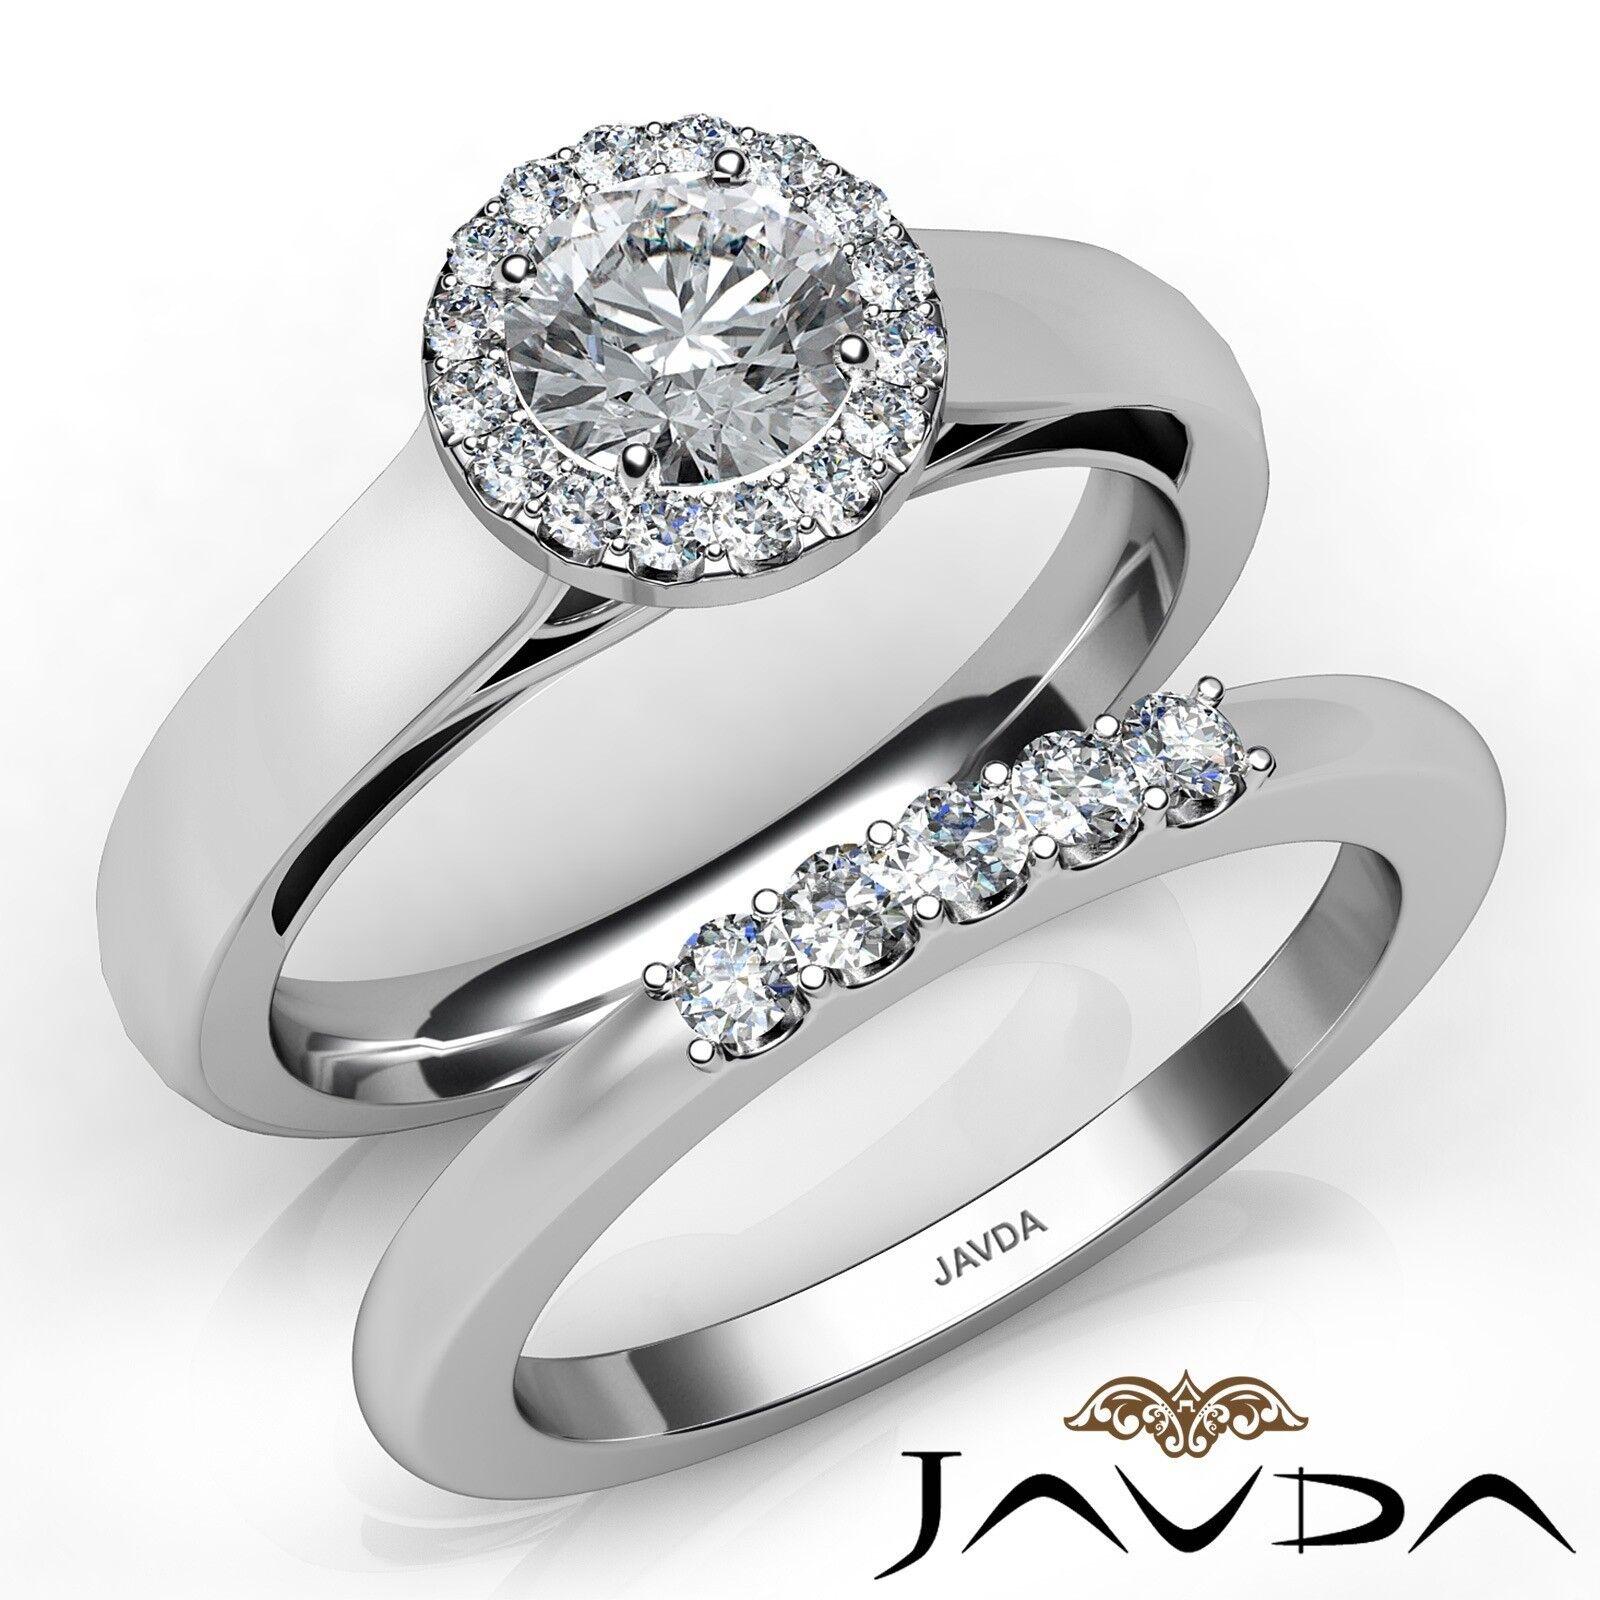 1ctw U Prong Halo Bridal Round Diamond Engagement Her Ring GIA G-VVS2 White Gold